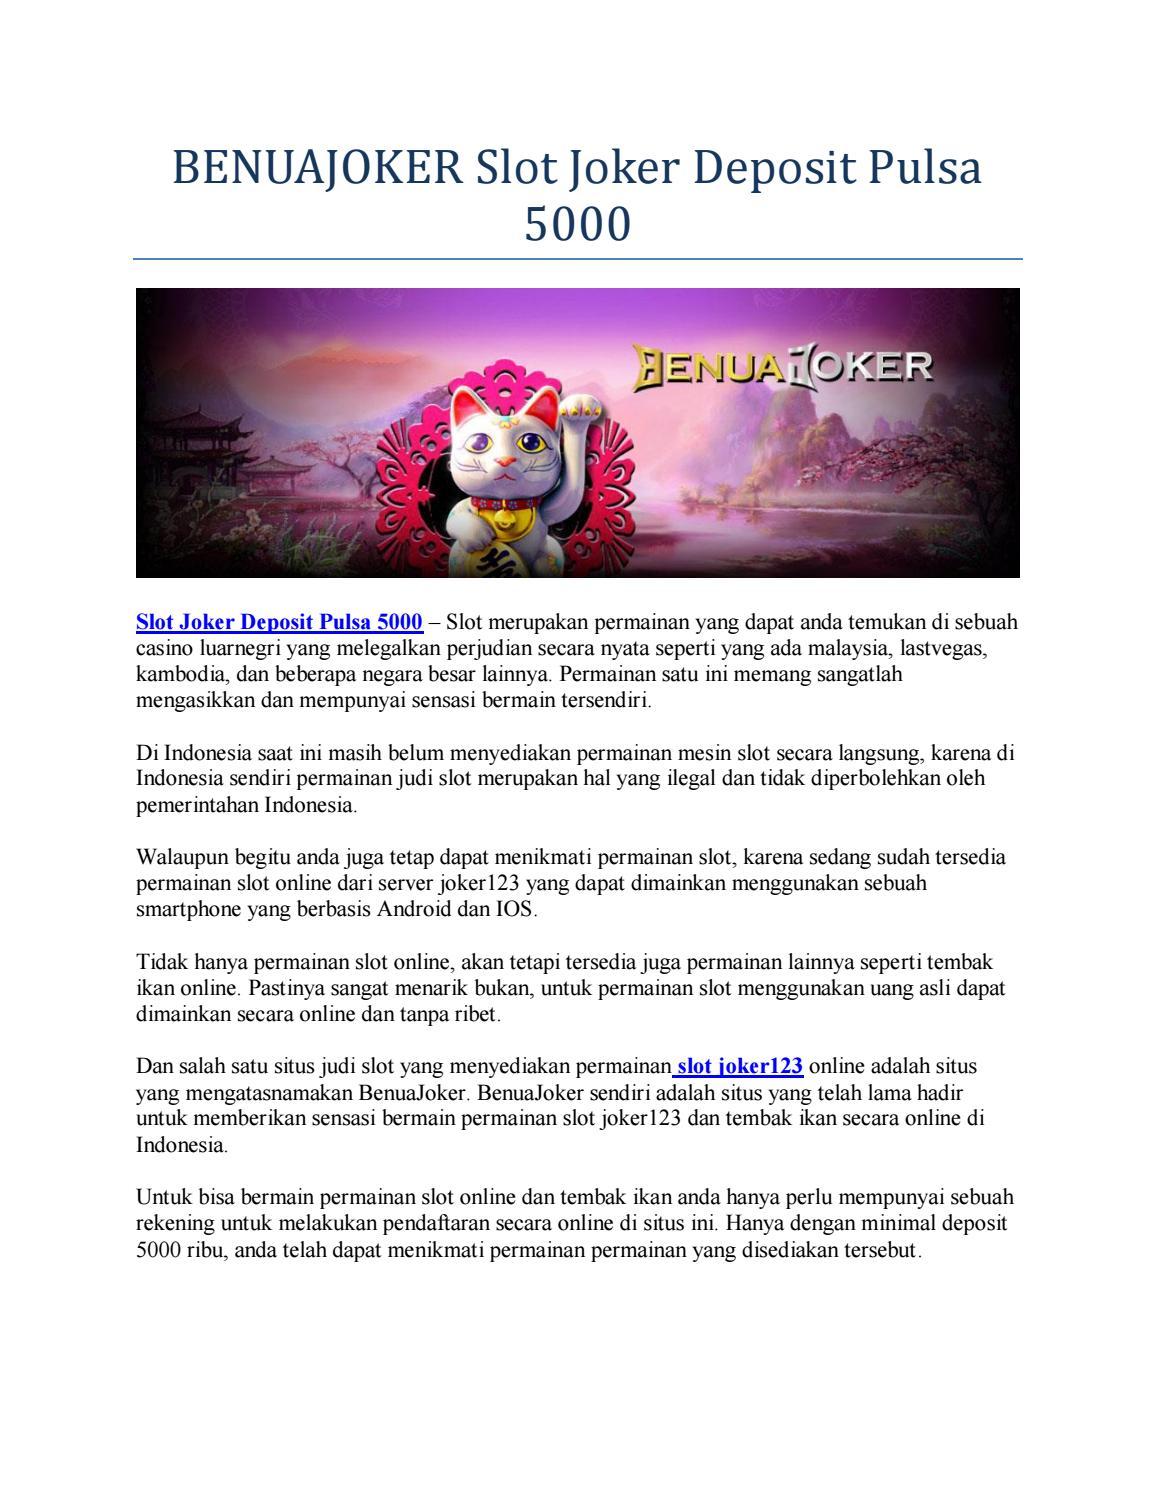 Benuajoker Slot Joker Deposit Pulsa 5000 By Slotjokeronline Issuu